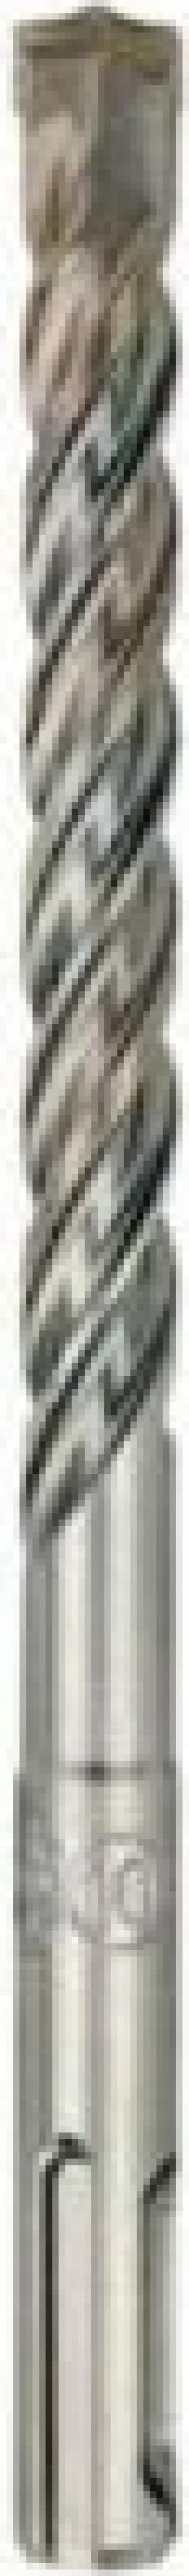 Burghiu SDS-plus EXTREME 2 12x200x260 mm Dewalt Accesorii masini de gaurit